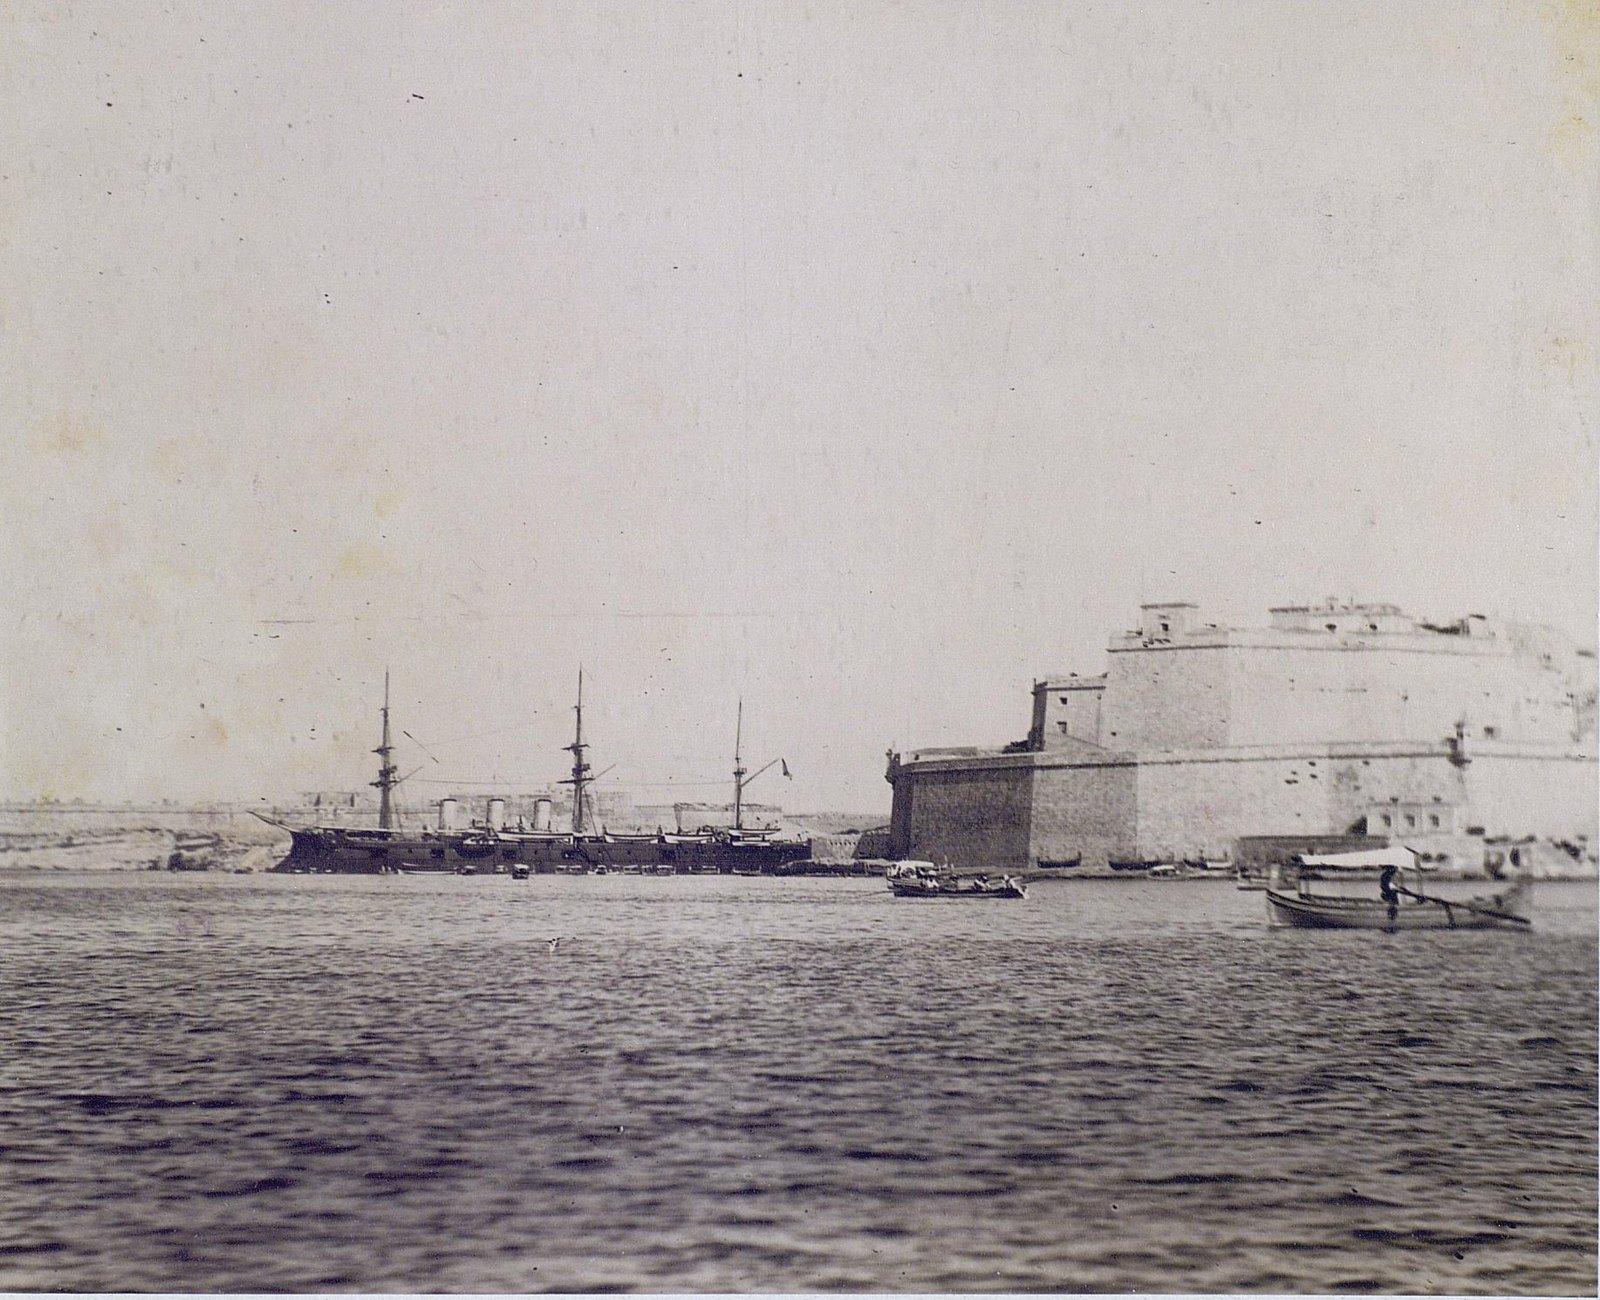 1890. Фрегат «Память Азова» у острова Мальта